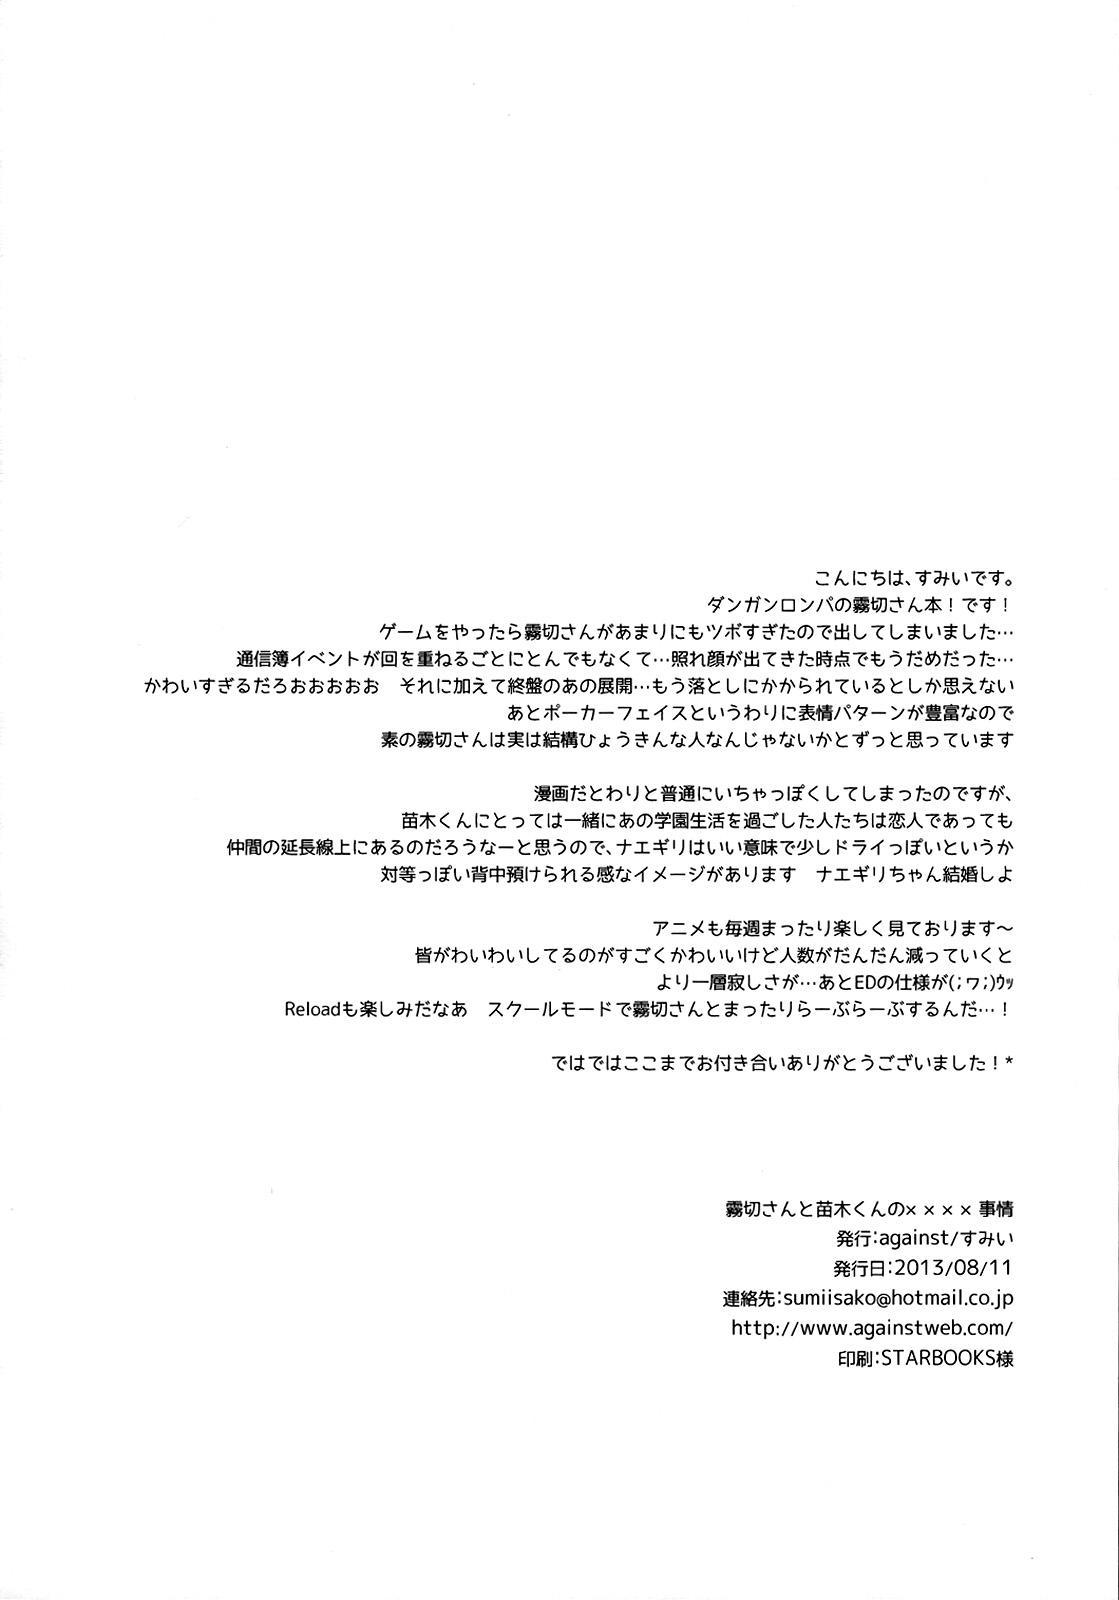 (C84) [against (Sumii)] Kirigiri-san to Naegi-kun no xxxx Jijou | Kirigiri-san and Naegi-kun's XXXX Circumstances (Danganronpa) [English] {Blue Pierce} 16